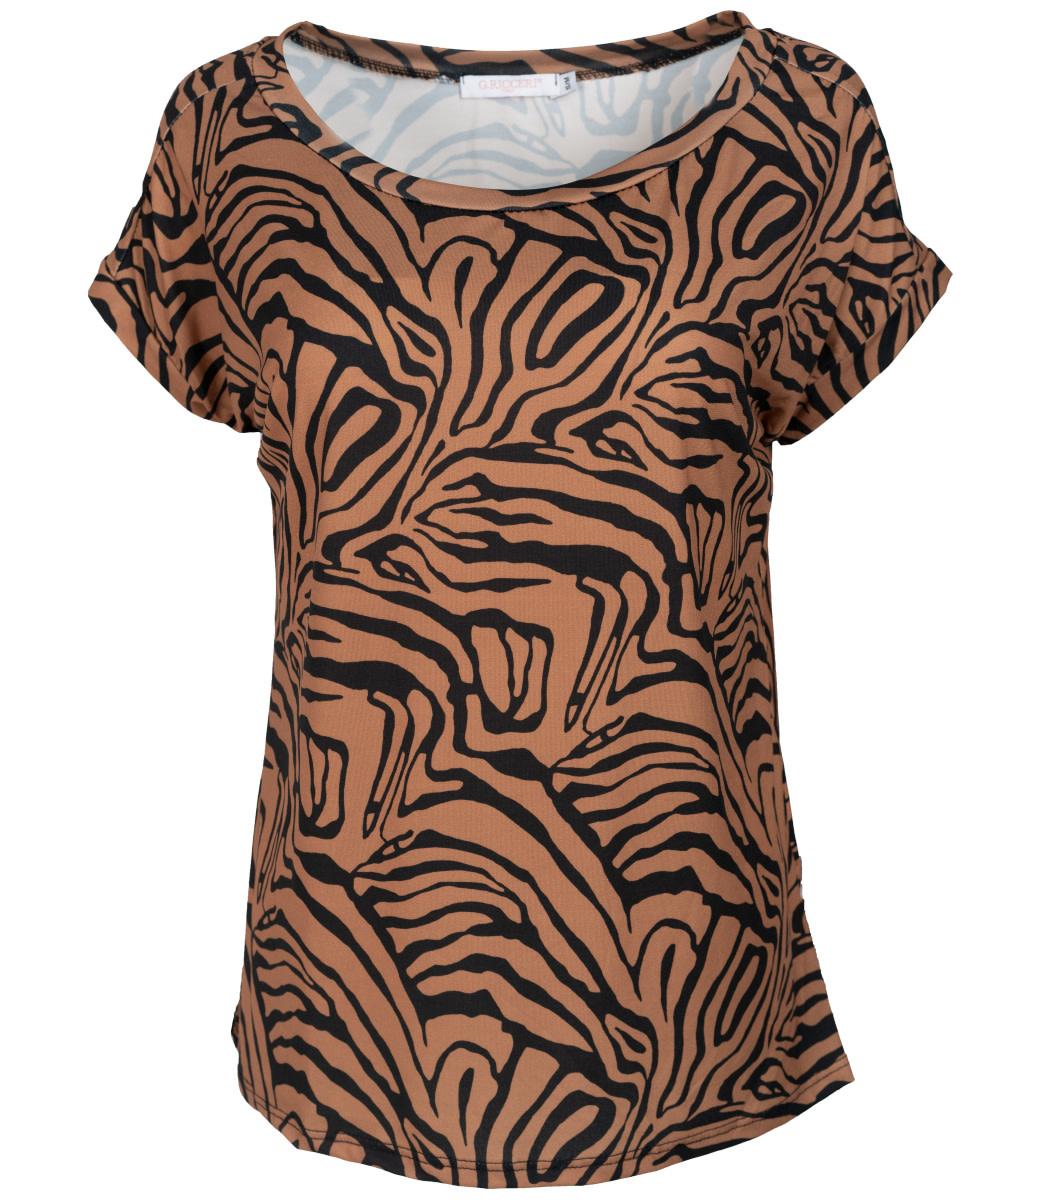 Gemma Ricceri Shirt zwart/camel print Nina